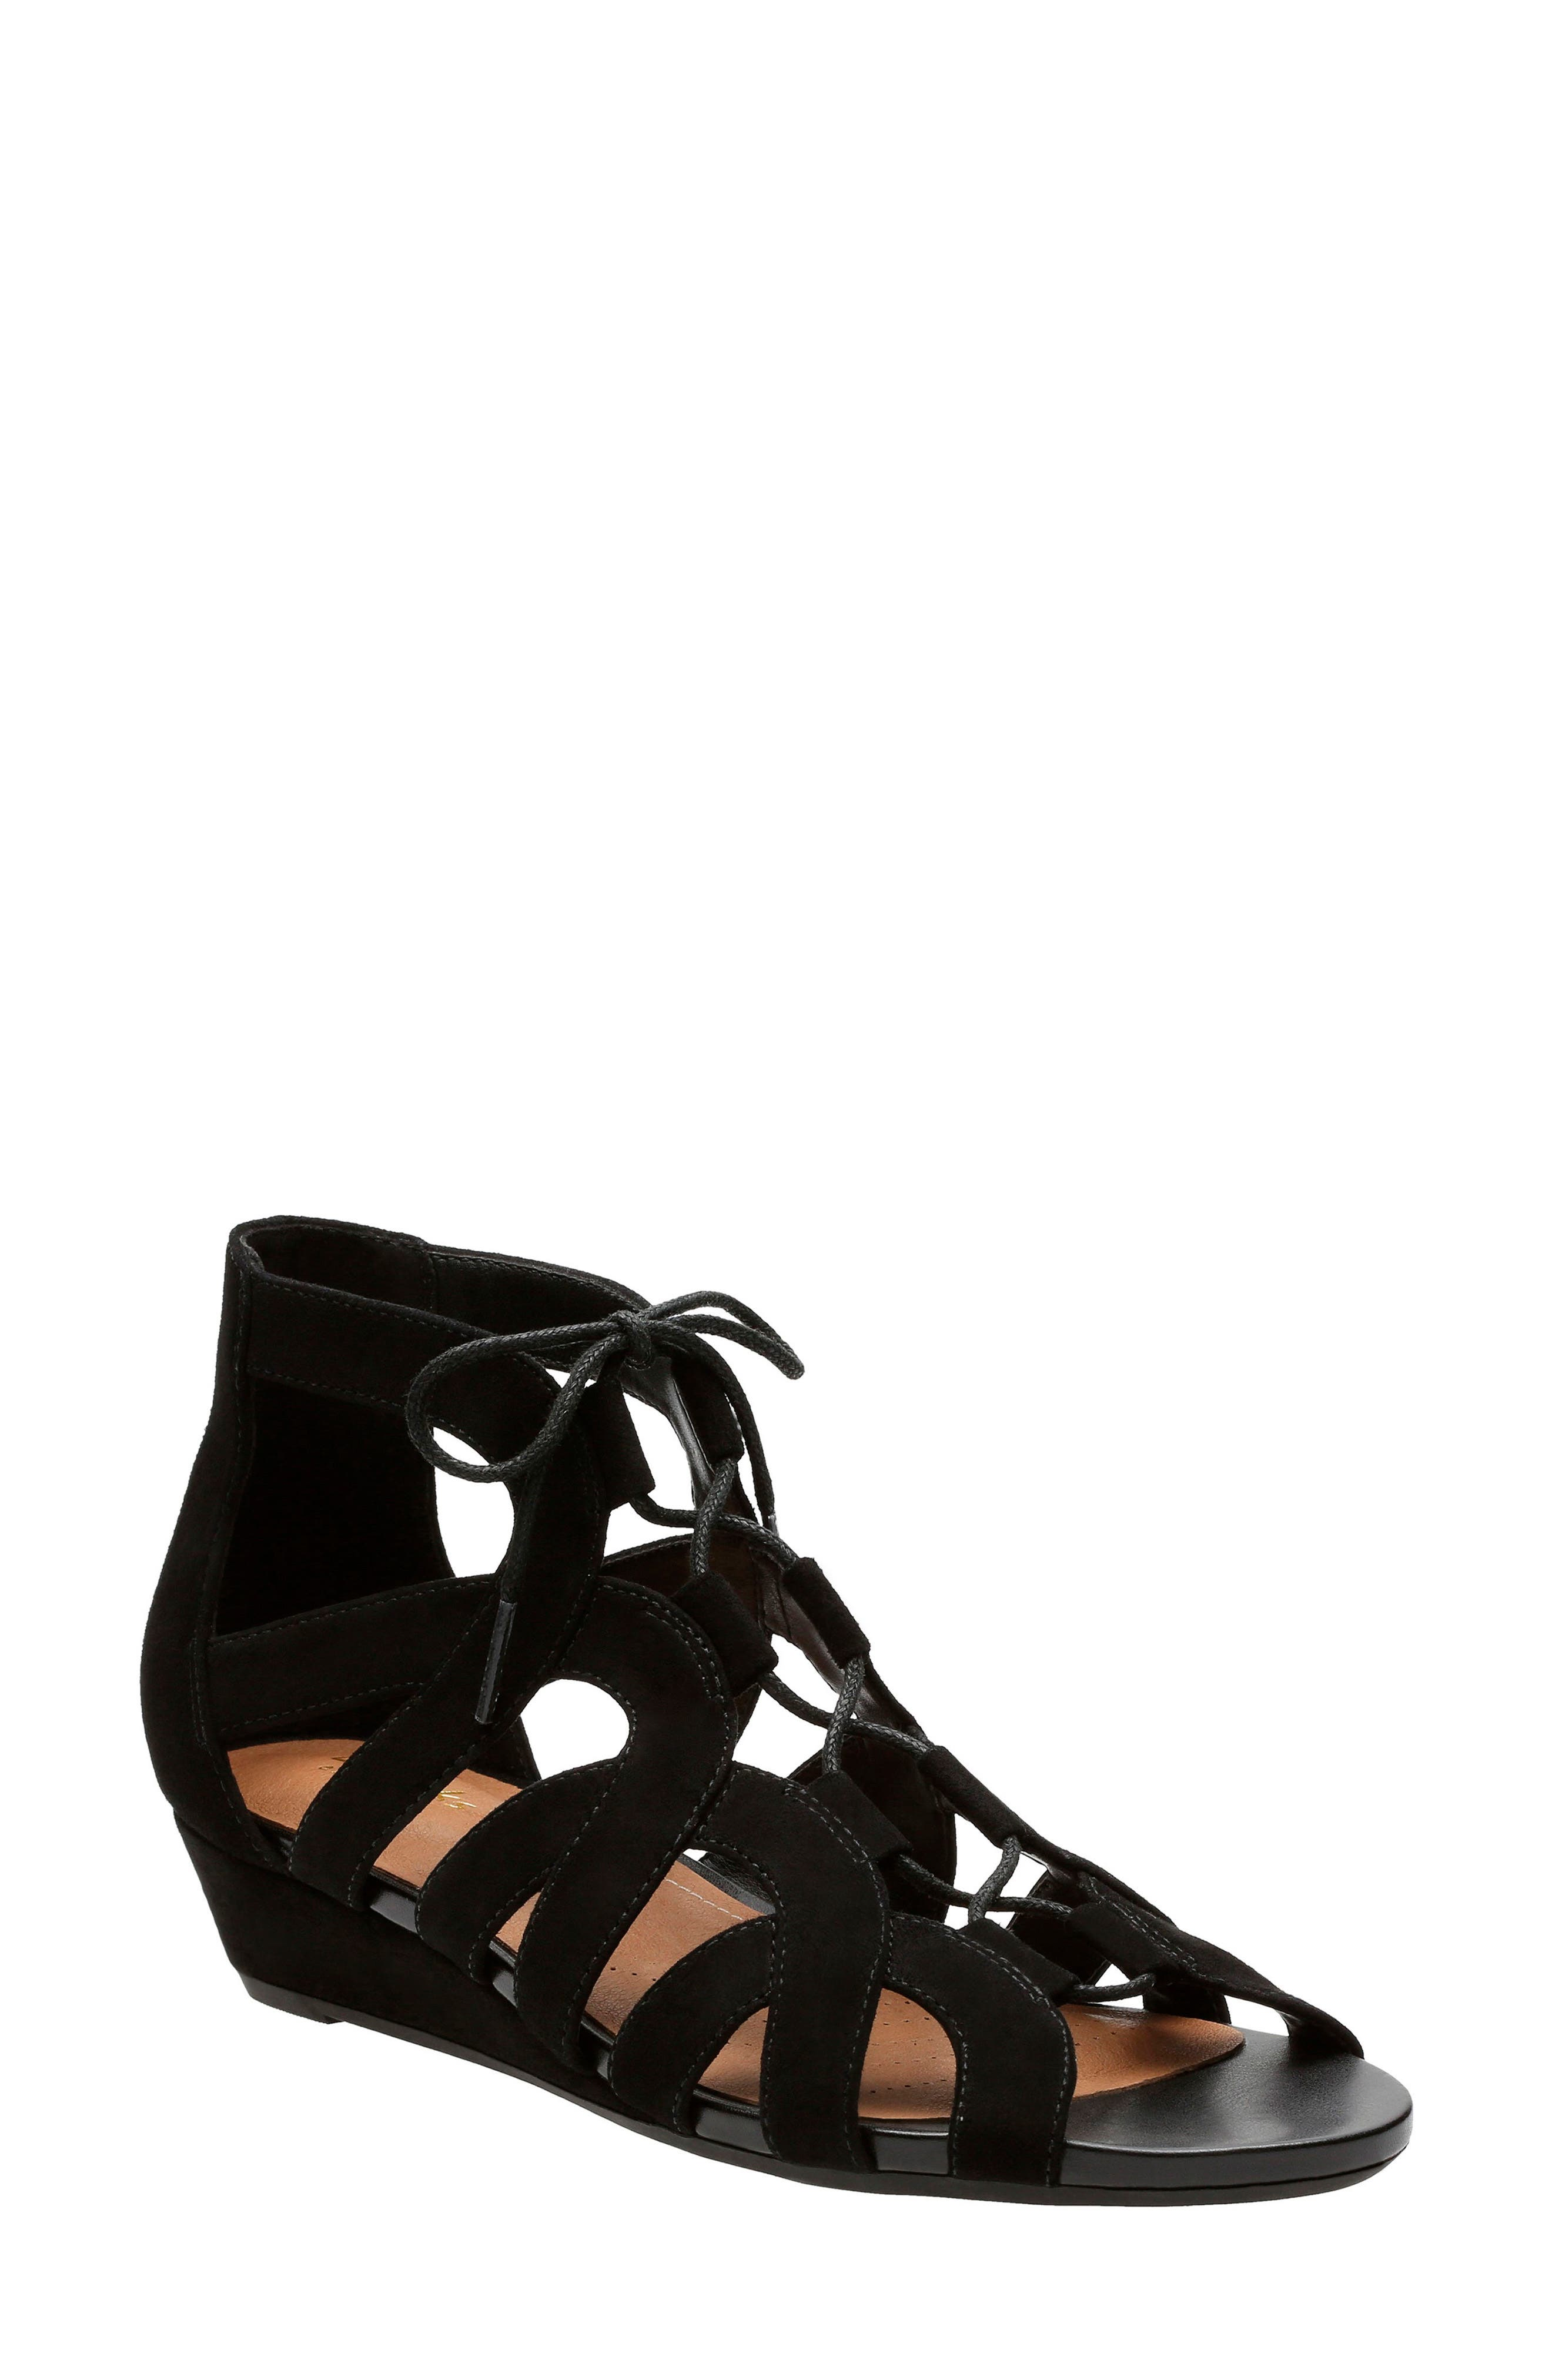 Alternate Image 1 Selected - Clarks® Parram Lux Sandal (Women)